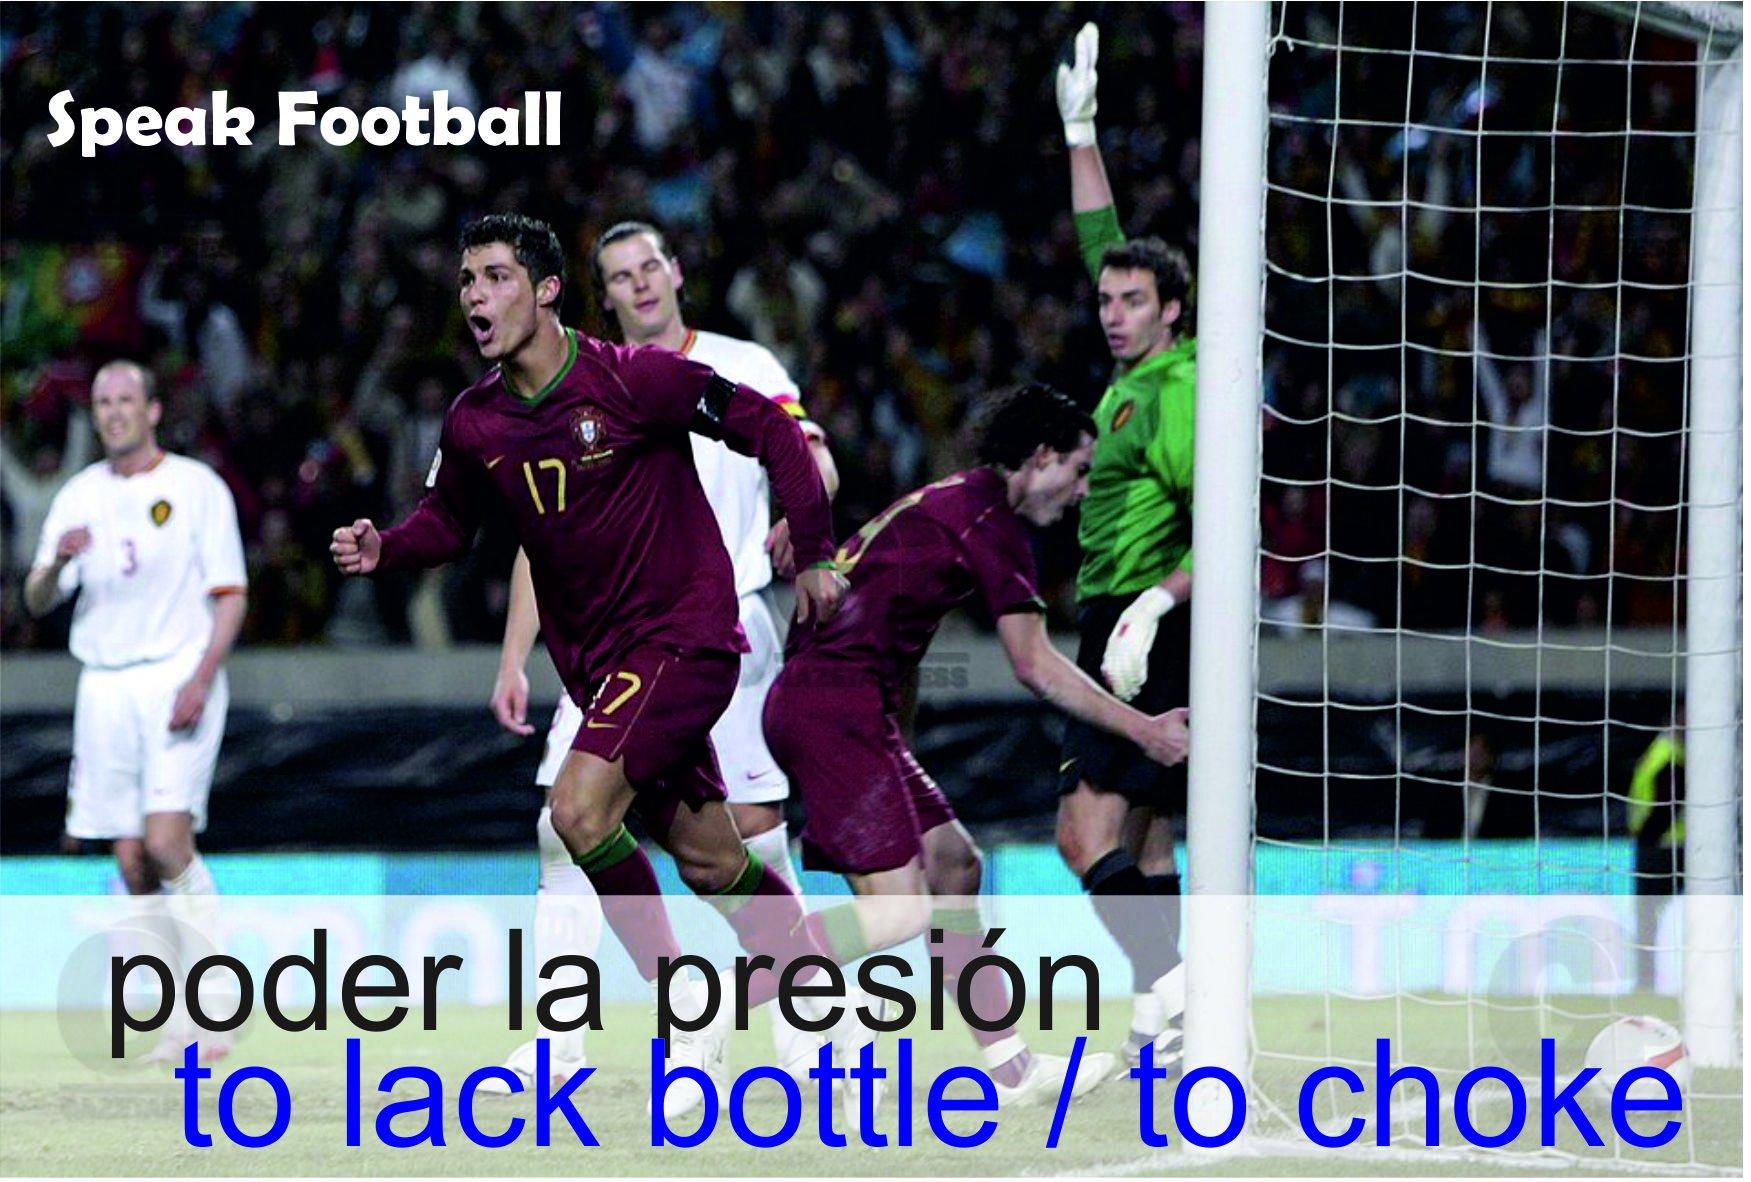 🇪🇸 Poder la presión 🇬🇧 To choke 🇬🇧 To lack bottle  🇪🇸 A Bélgica le pudo la presión contra Portugal en los cuartos de final de la Euro 2008 y fueron batidos. 🇬🇧 Belgium choked against Portugal in the Euro 2008 quarter-final match and were beaten.  #SpeakFootball @GrupoVaughan https://t.co/zs0mxJkS6z